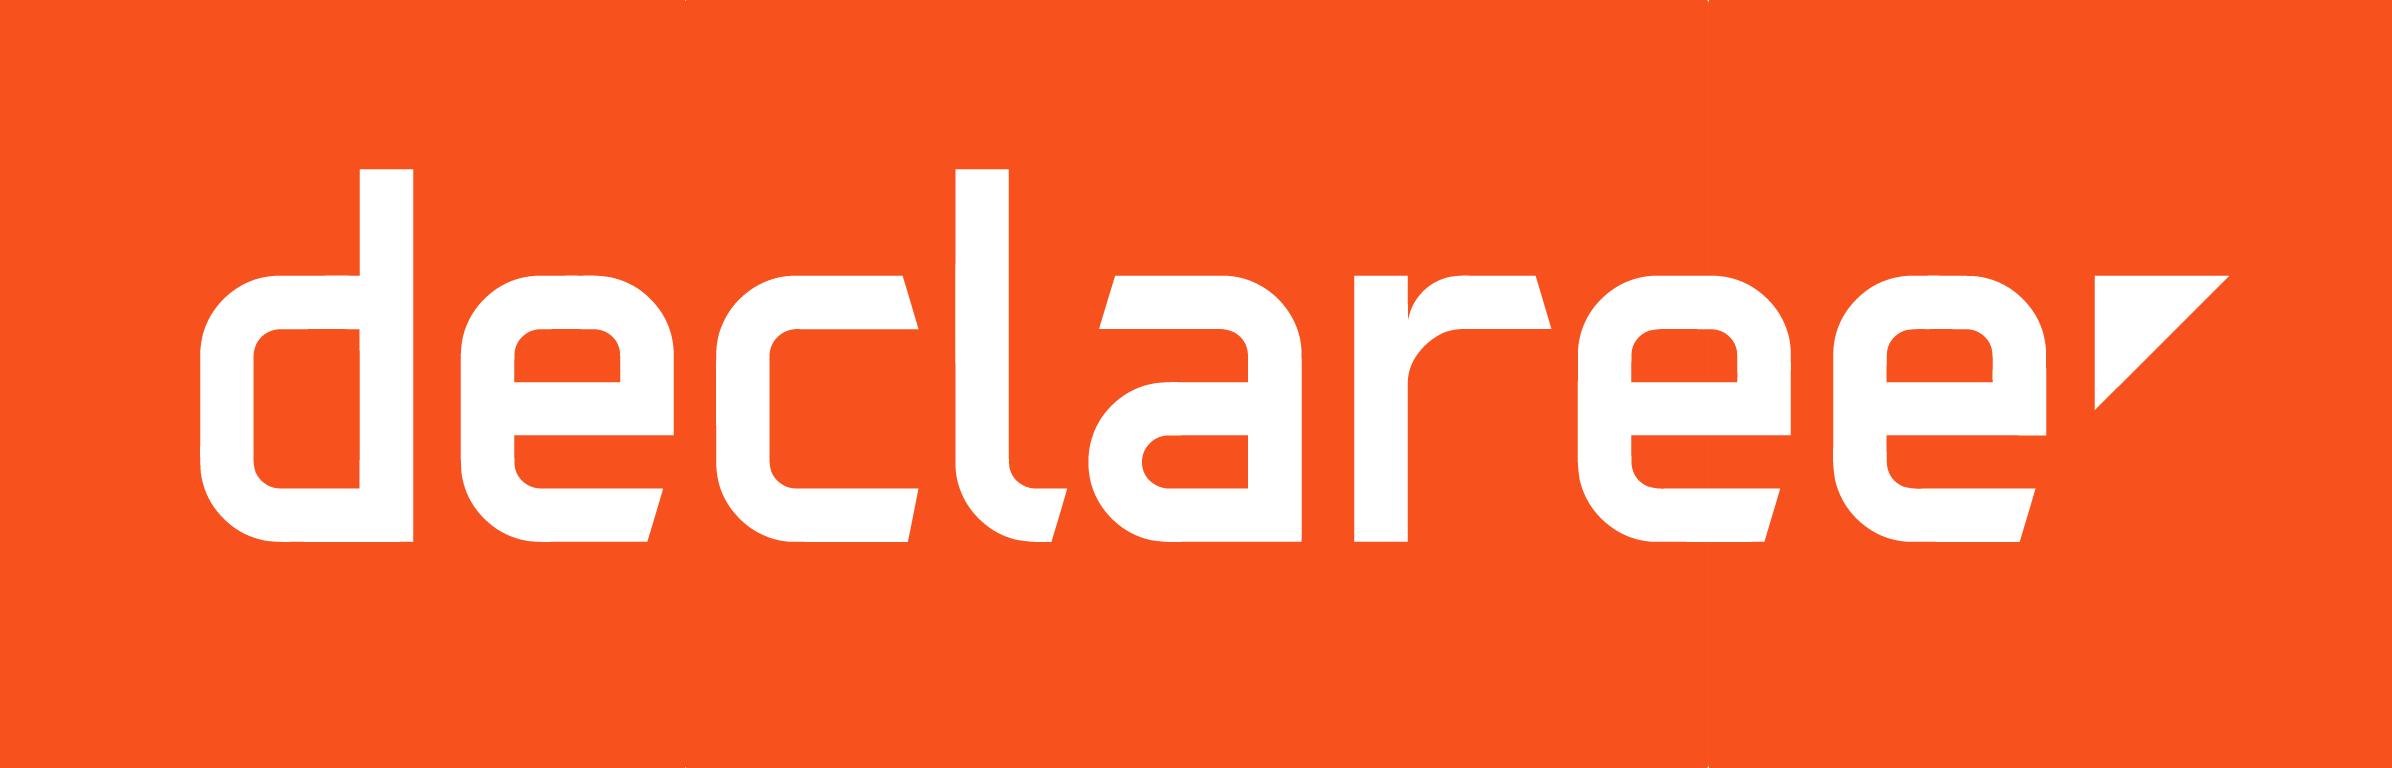 Review Declaree: Expense Management Software - Appvizer